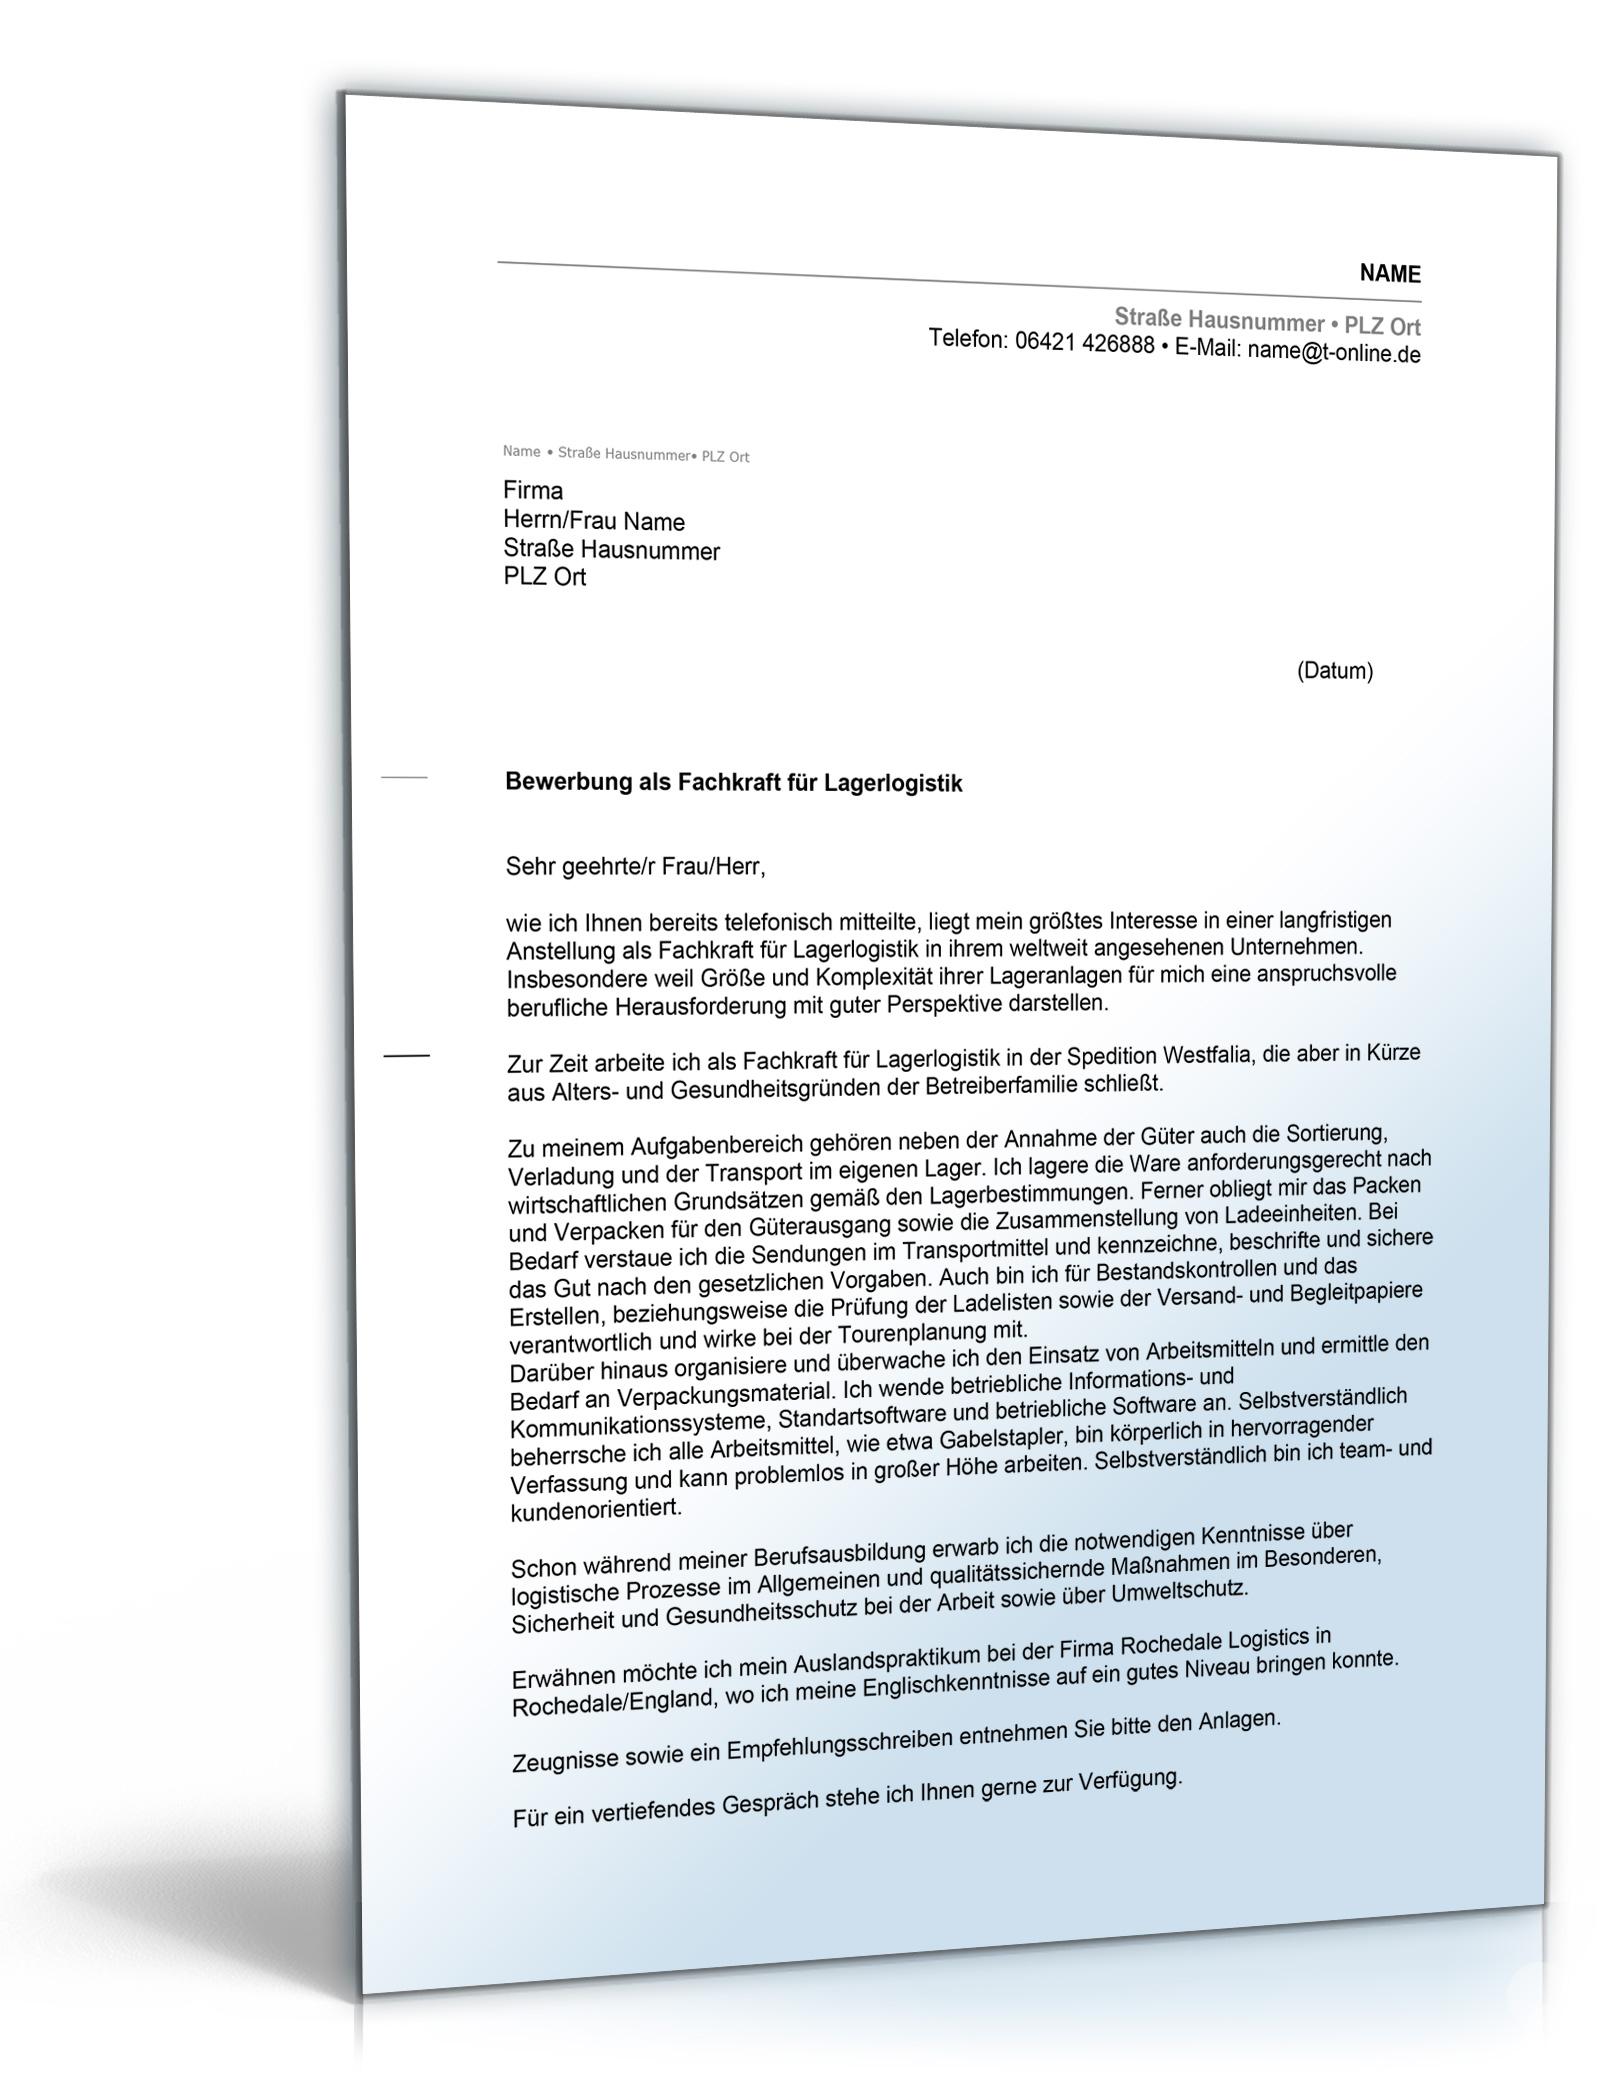 Anschreiben Bewerbung Lagerlogistik [Word Dokument]: Amazon.de